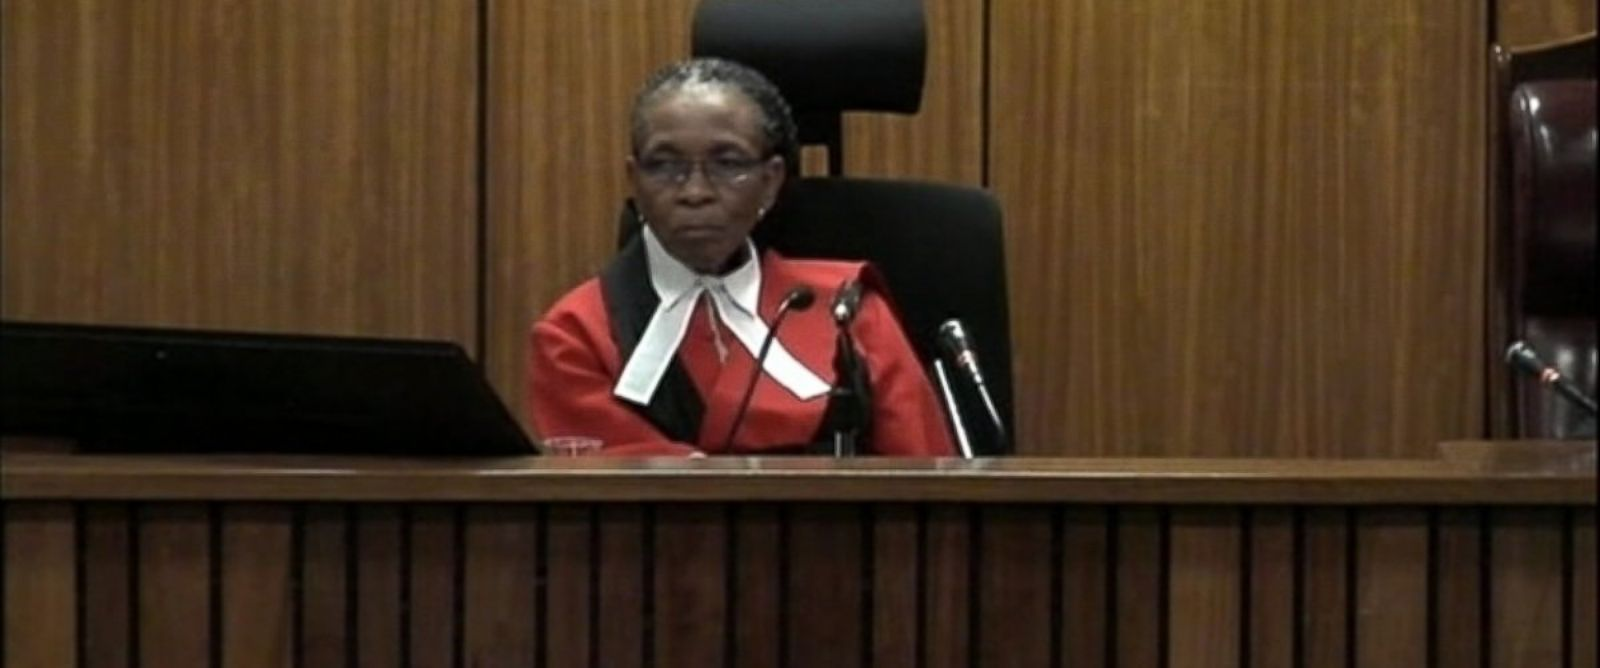 PHOTO: Judge Thokozile Masipa is seen presiding over the trial of Oscar Pistorius.